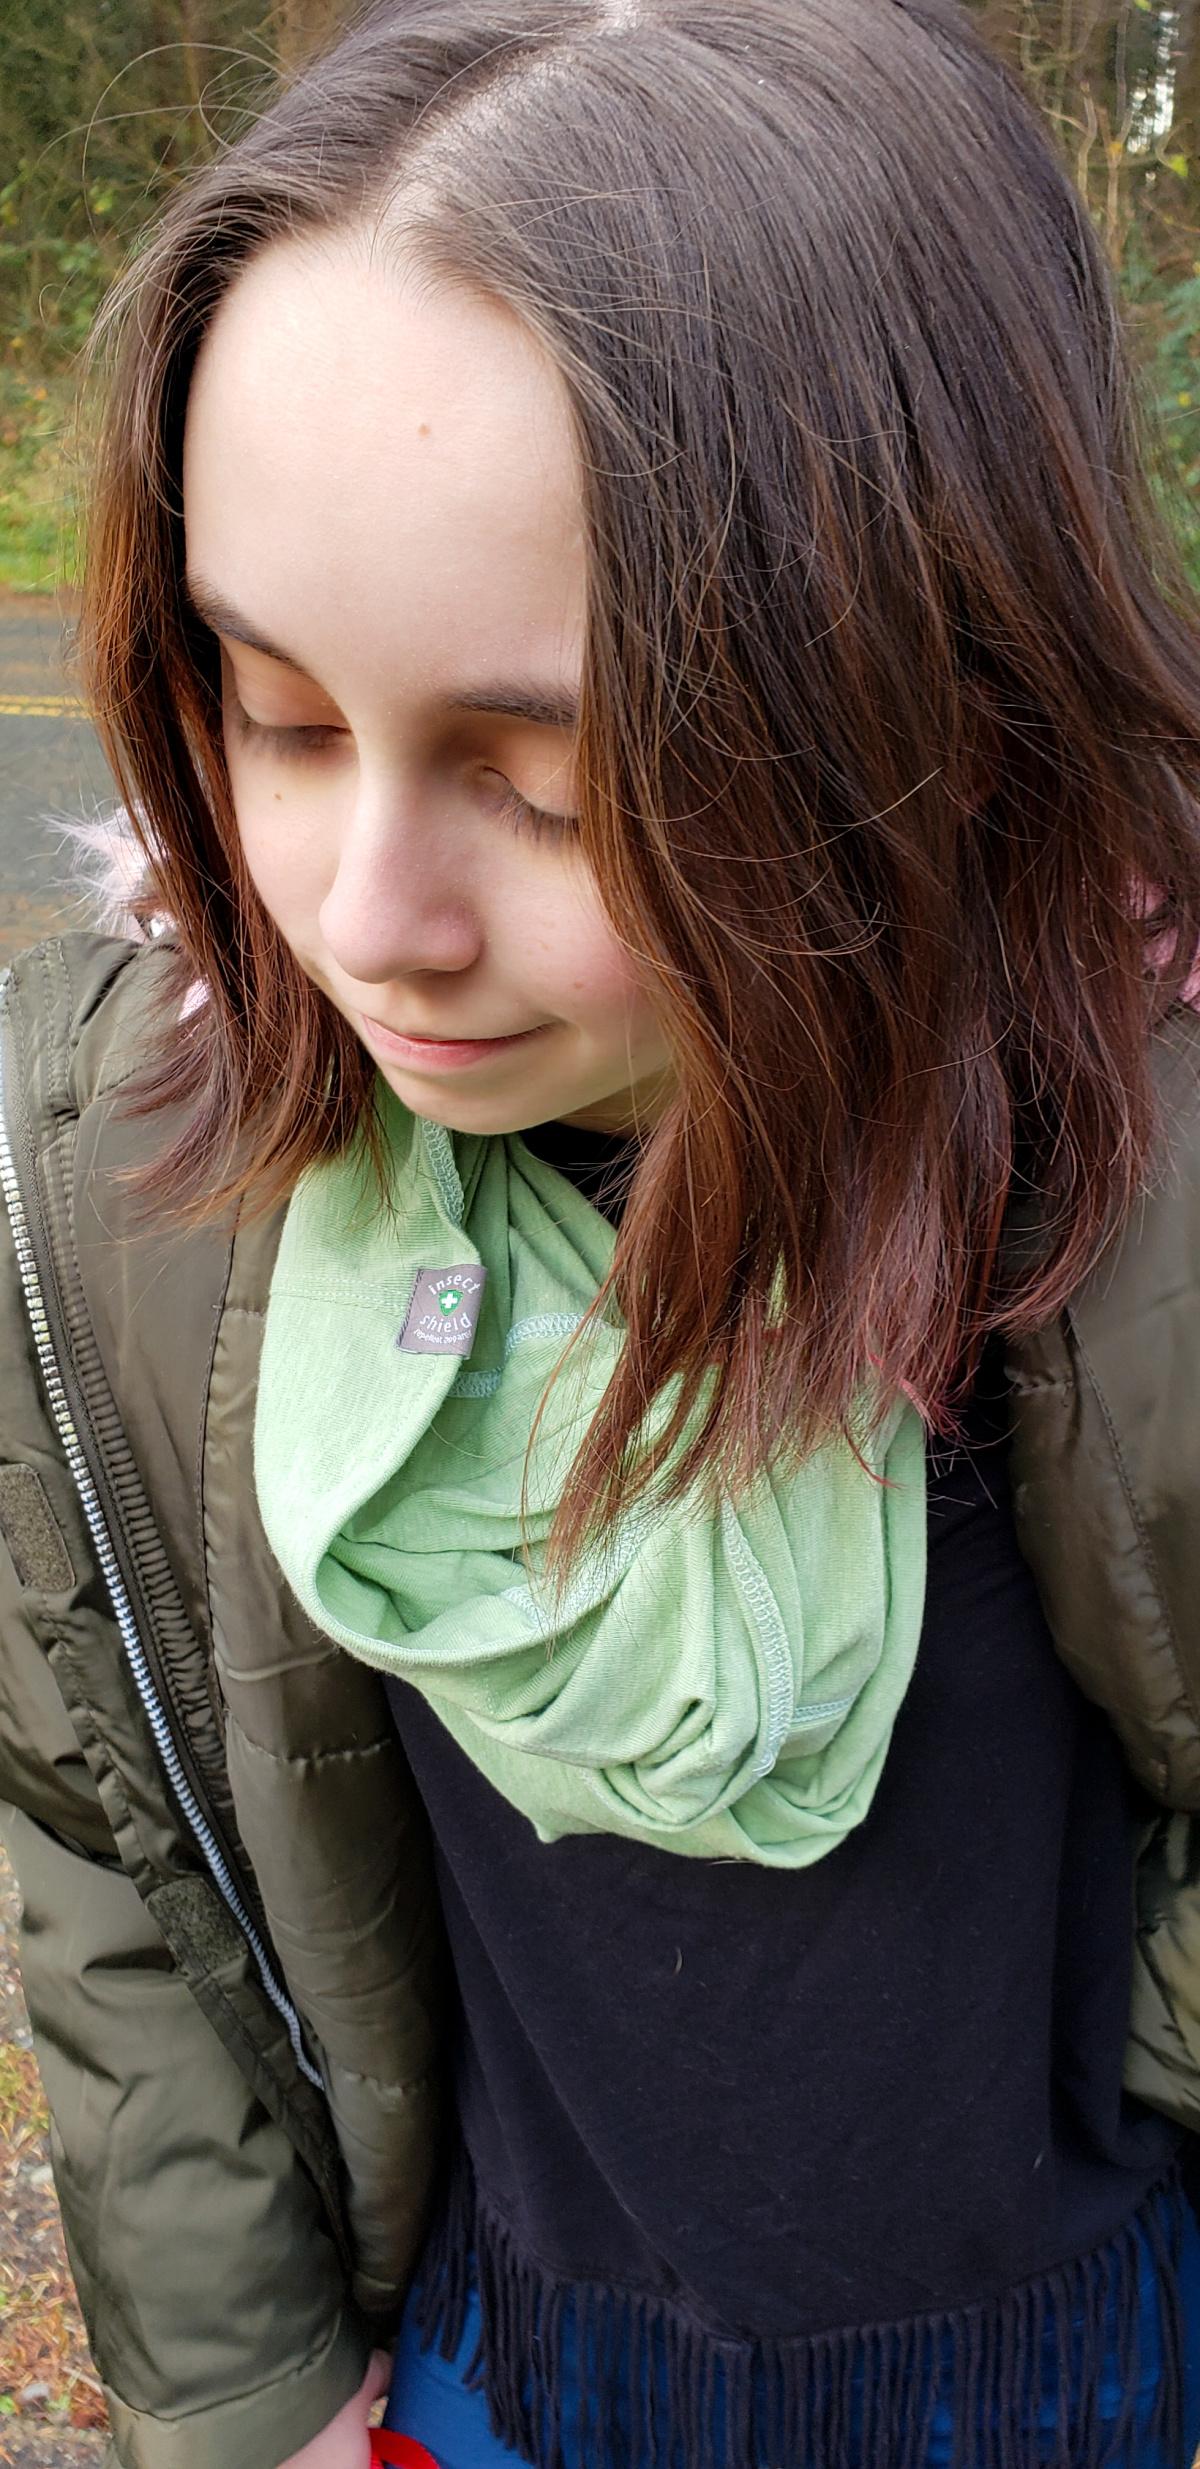 travel gear for women journey scarf